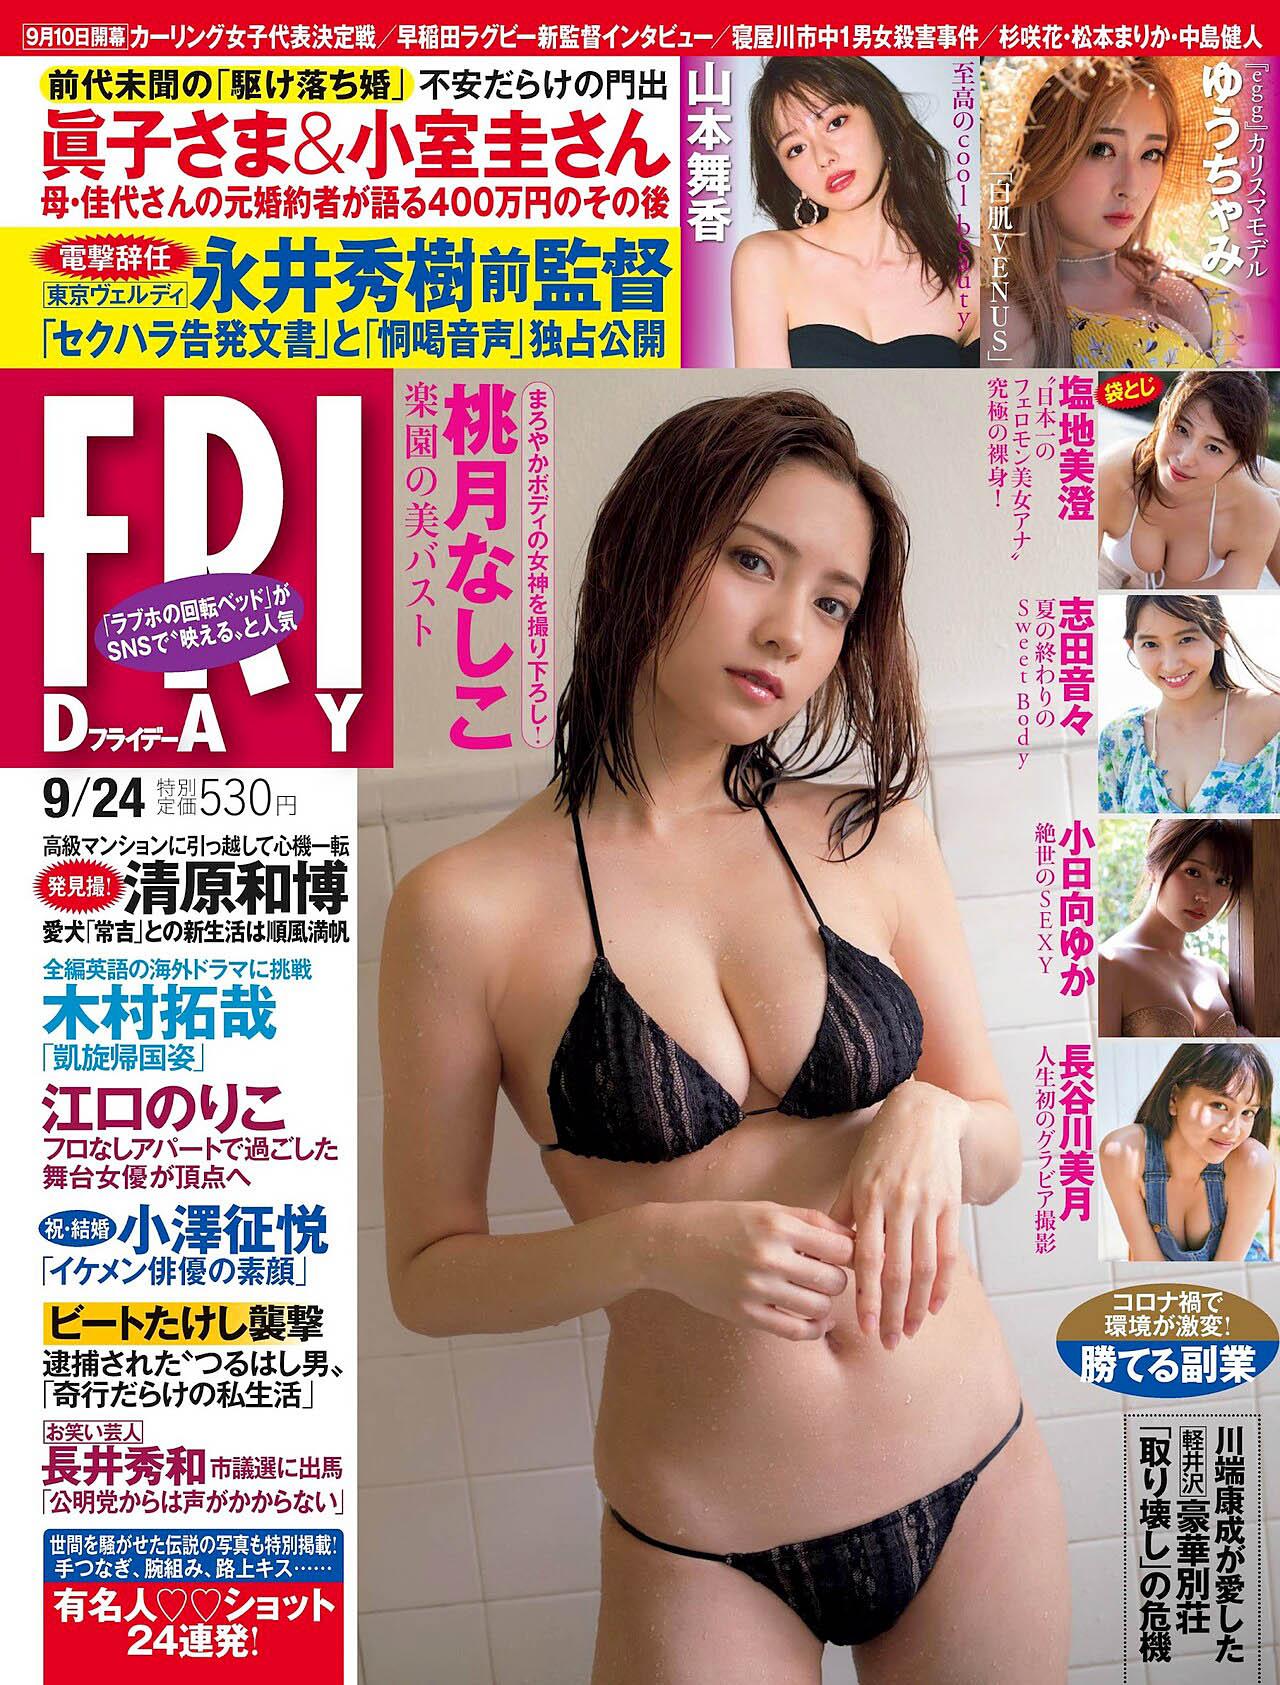 NMomotsuki Friday 210924 01.jpg